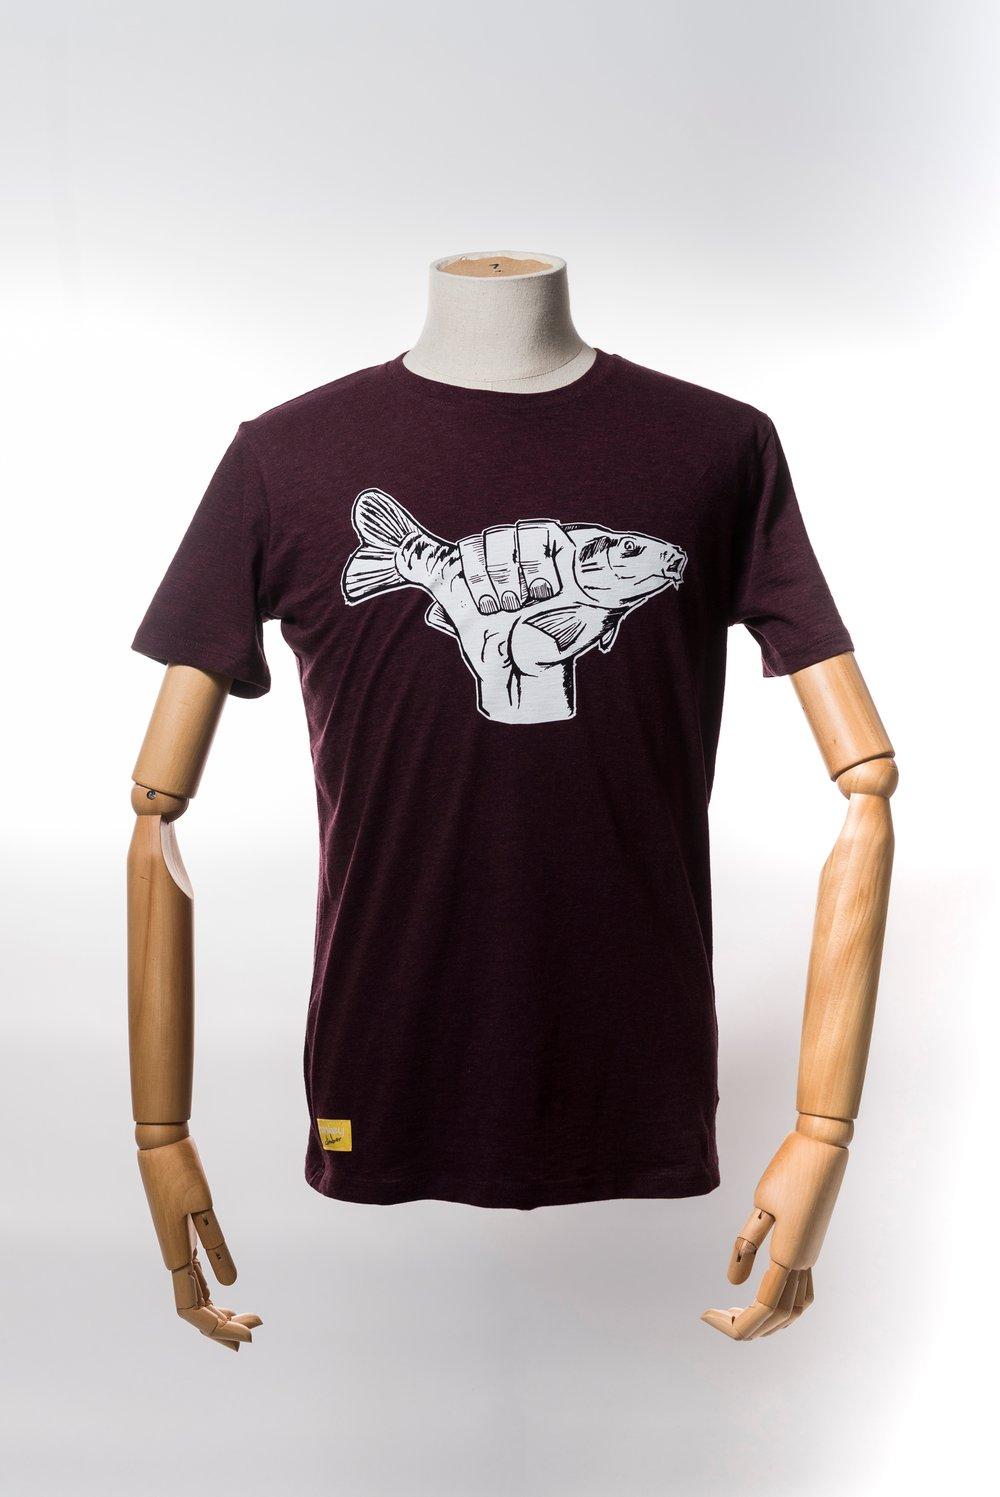 Image of Monkey Climber Carp Shaka shirt I Heather Red - Black - Clay